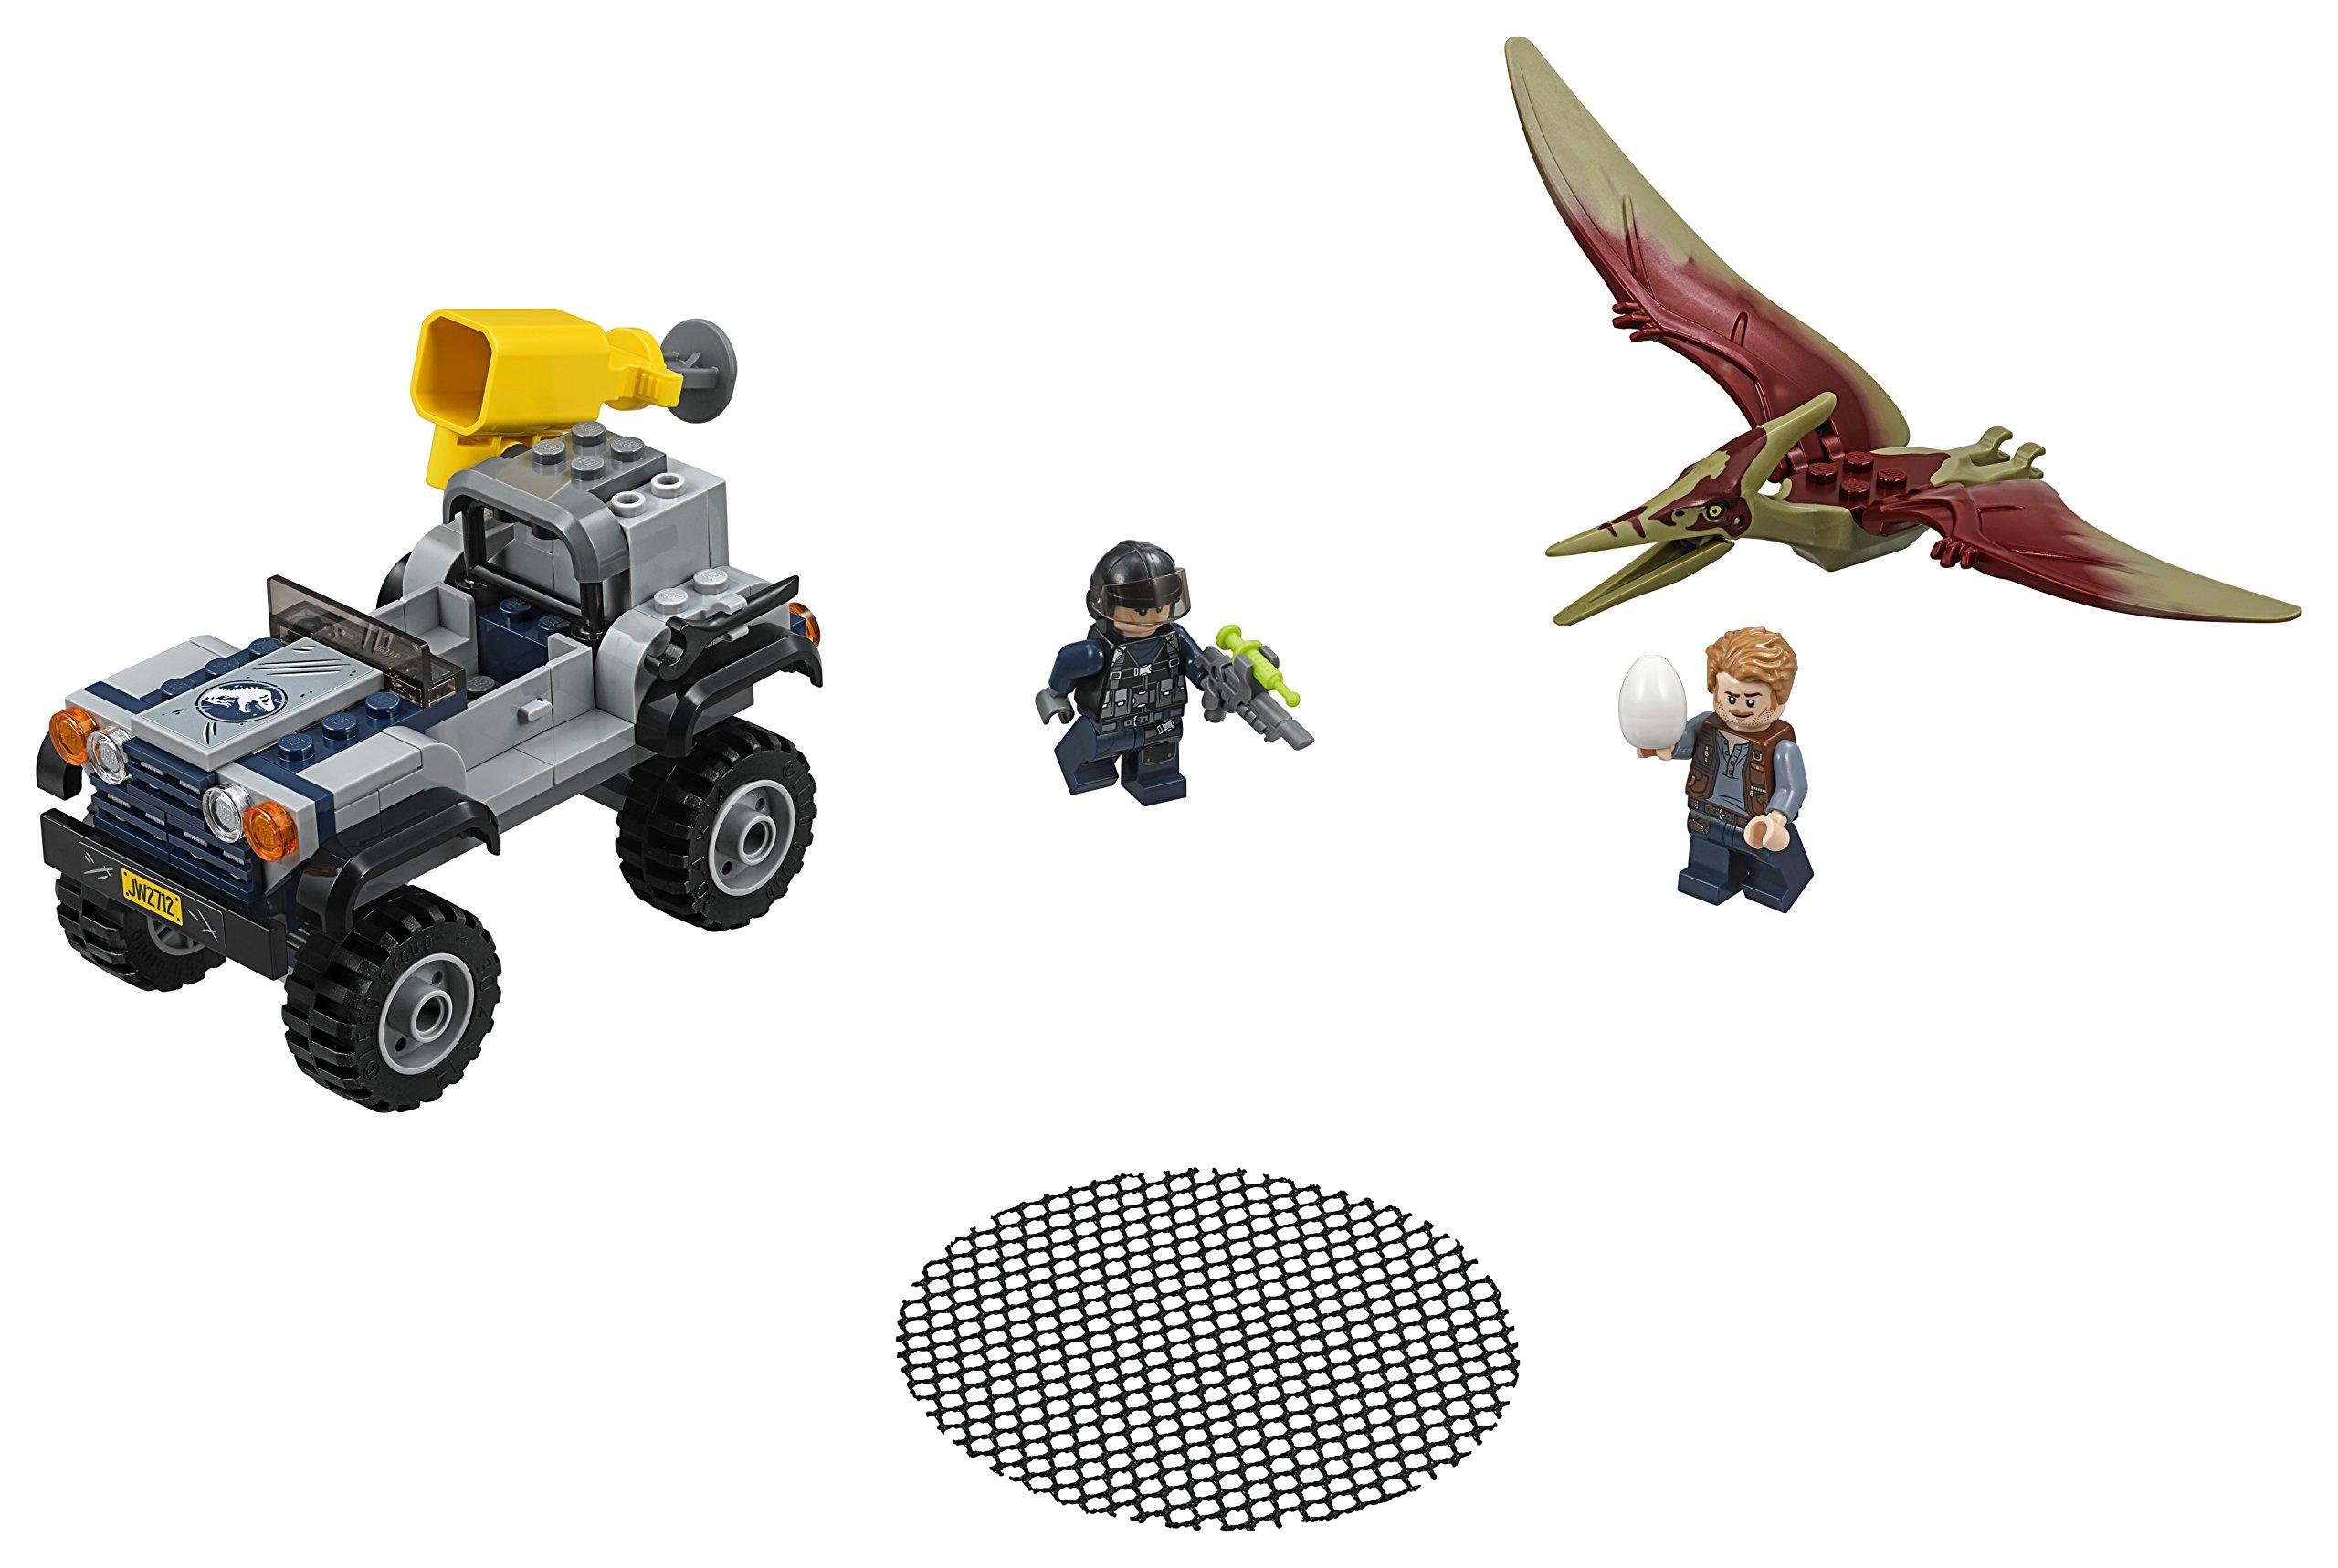 LEGO Jurassic World Pteranodon Chase 75926 Building Kit (126 Piece) by LEGO (Image #2)